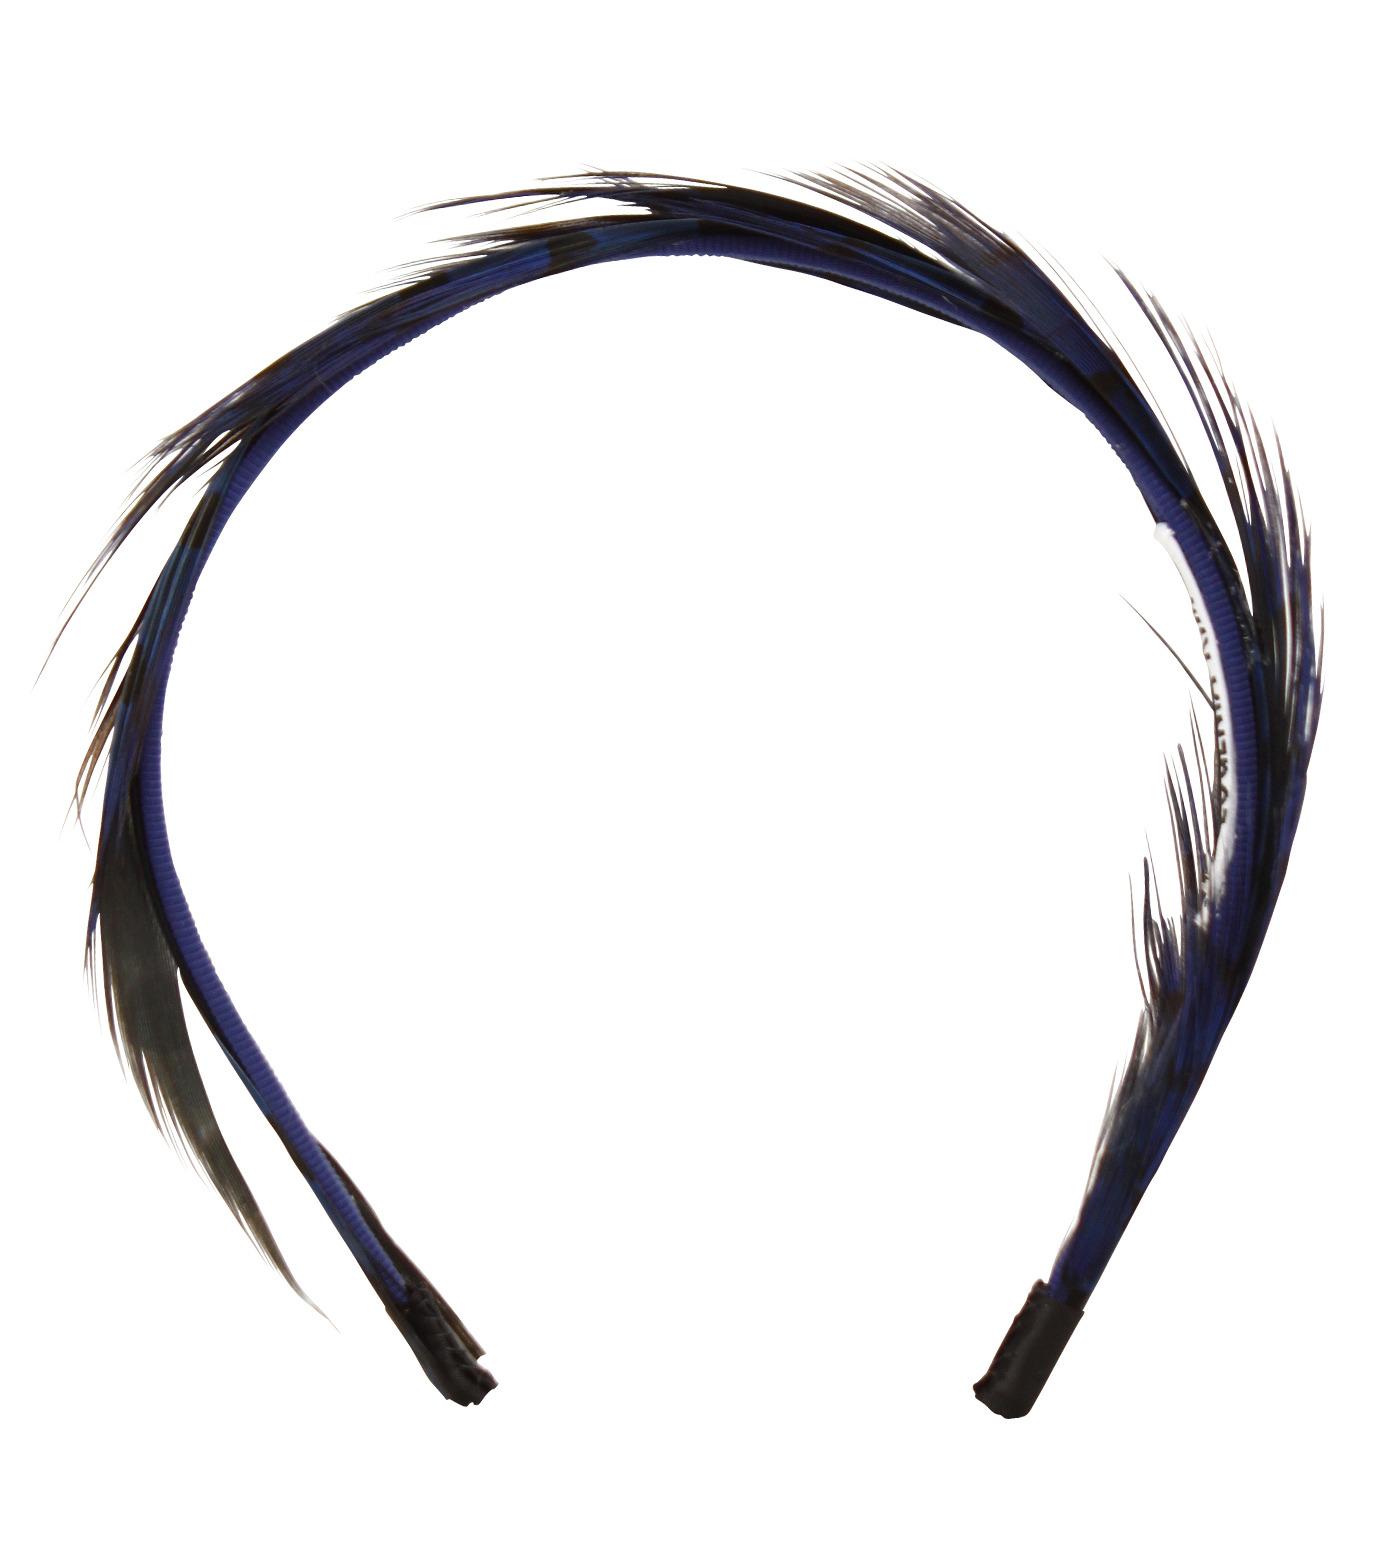 LE CIEL BLEU(ルシェルブルー)のFeather headband / Eugenia Kim-BLUE(アクセサリー/accessory)-2285-1447-L 拡大詳細画像1